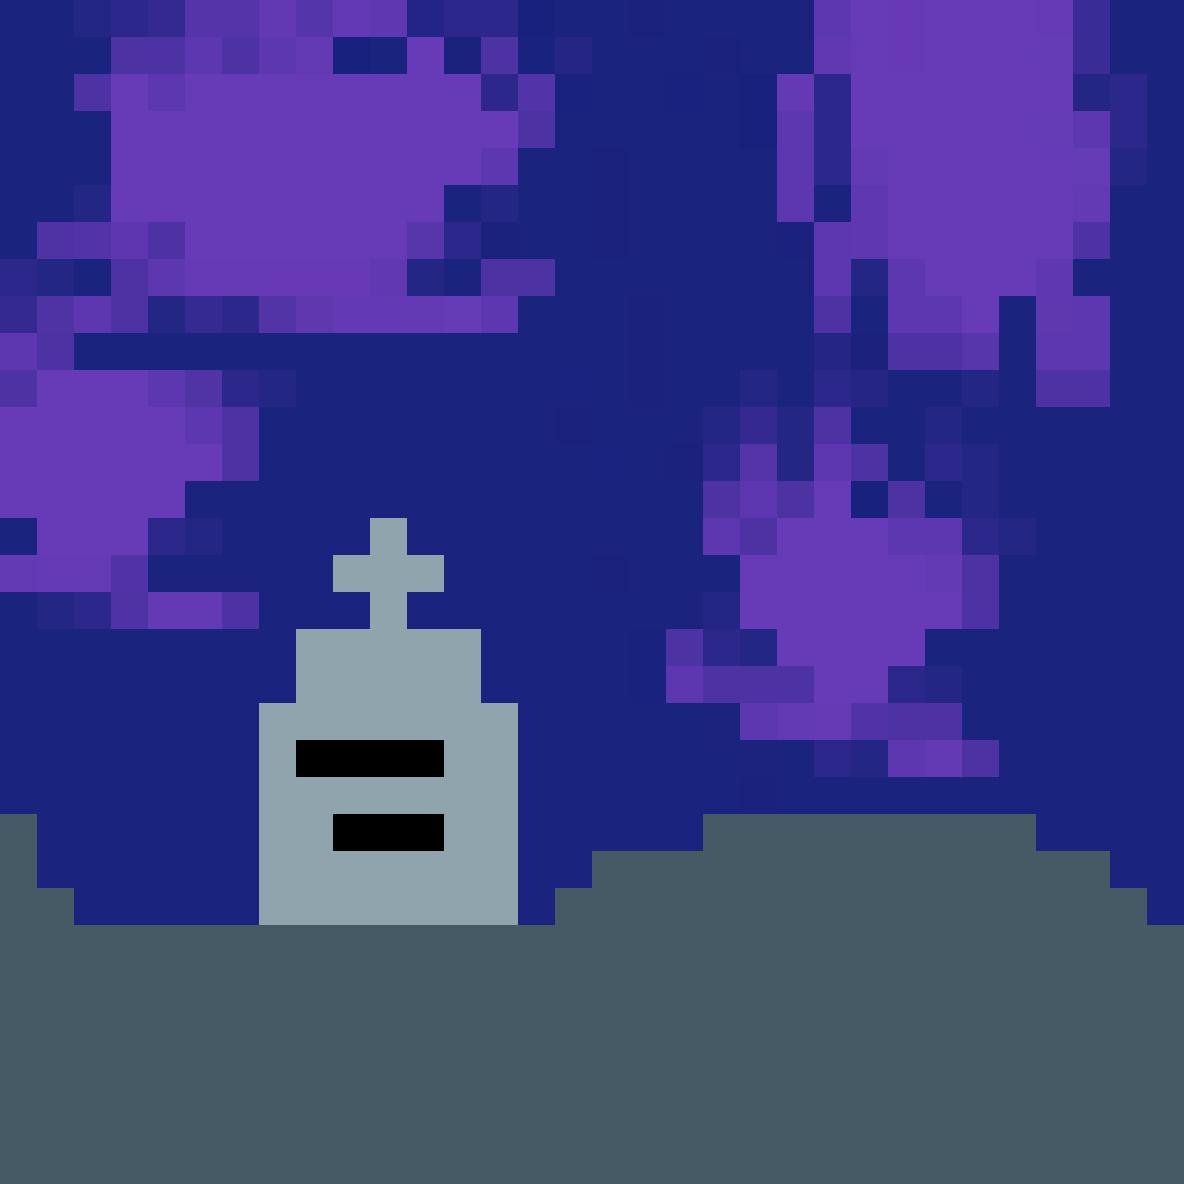 main-image-Spooky Graveyard   by MythicalPanda